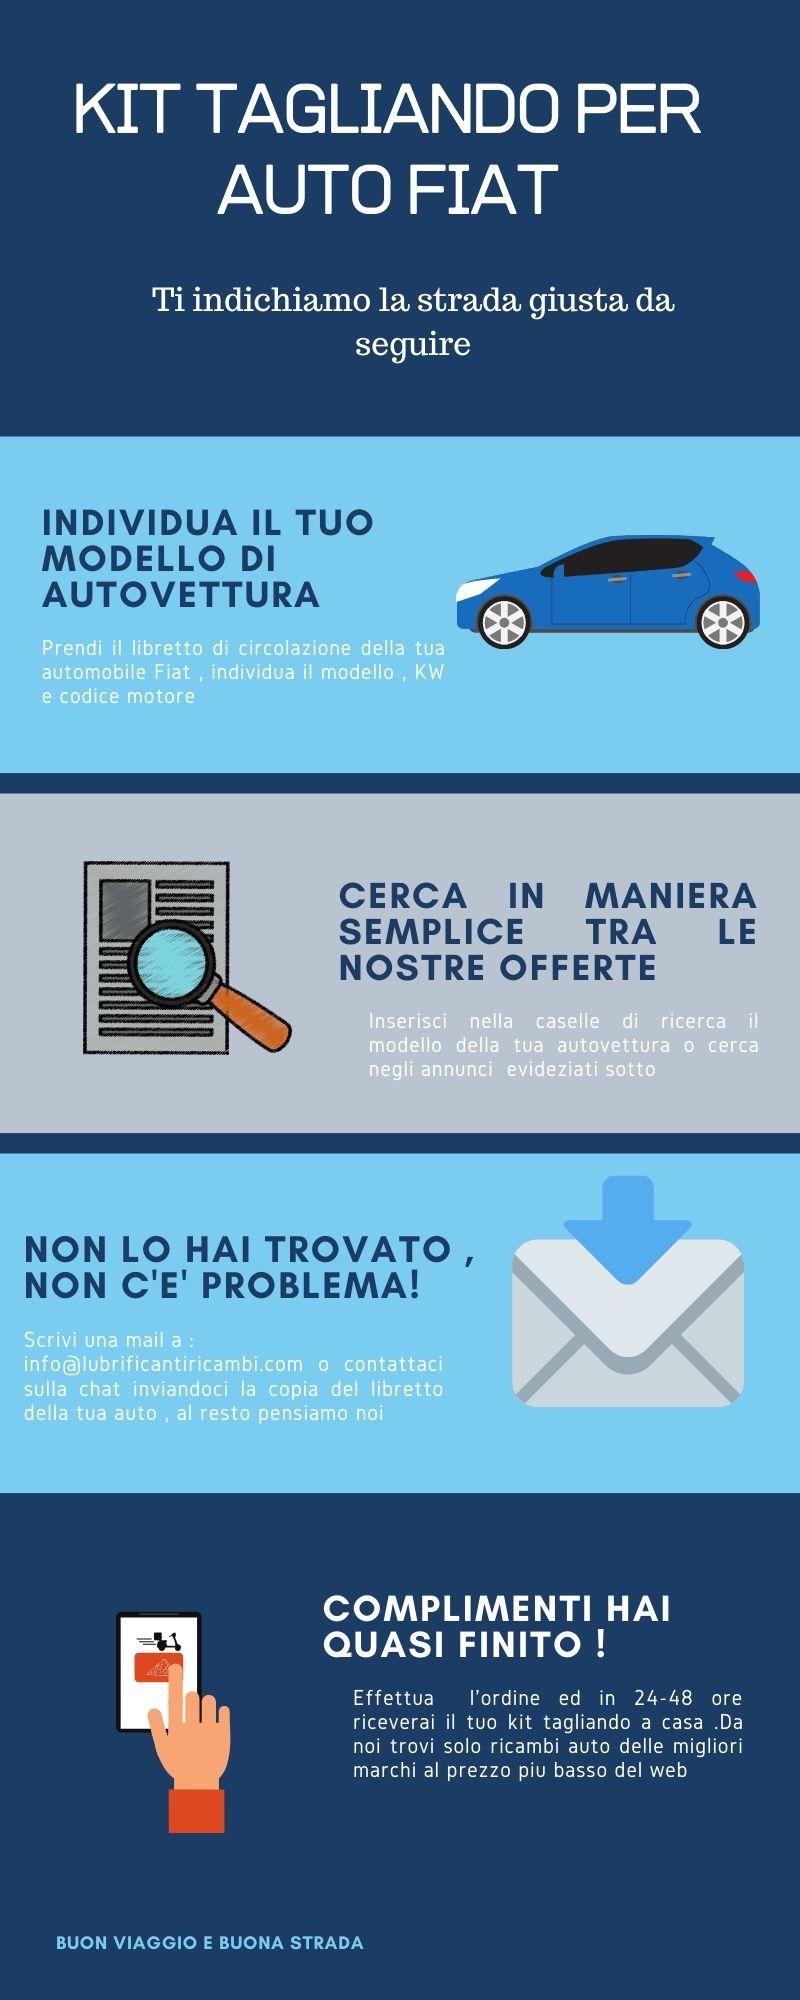 Kit Tagliando auto Fiat